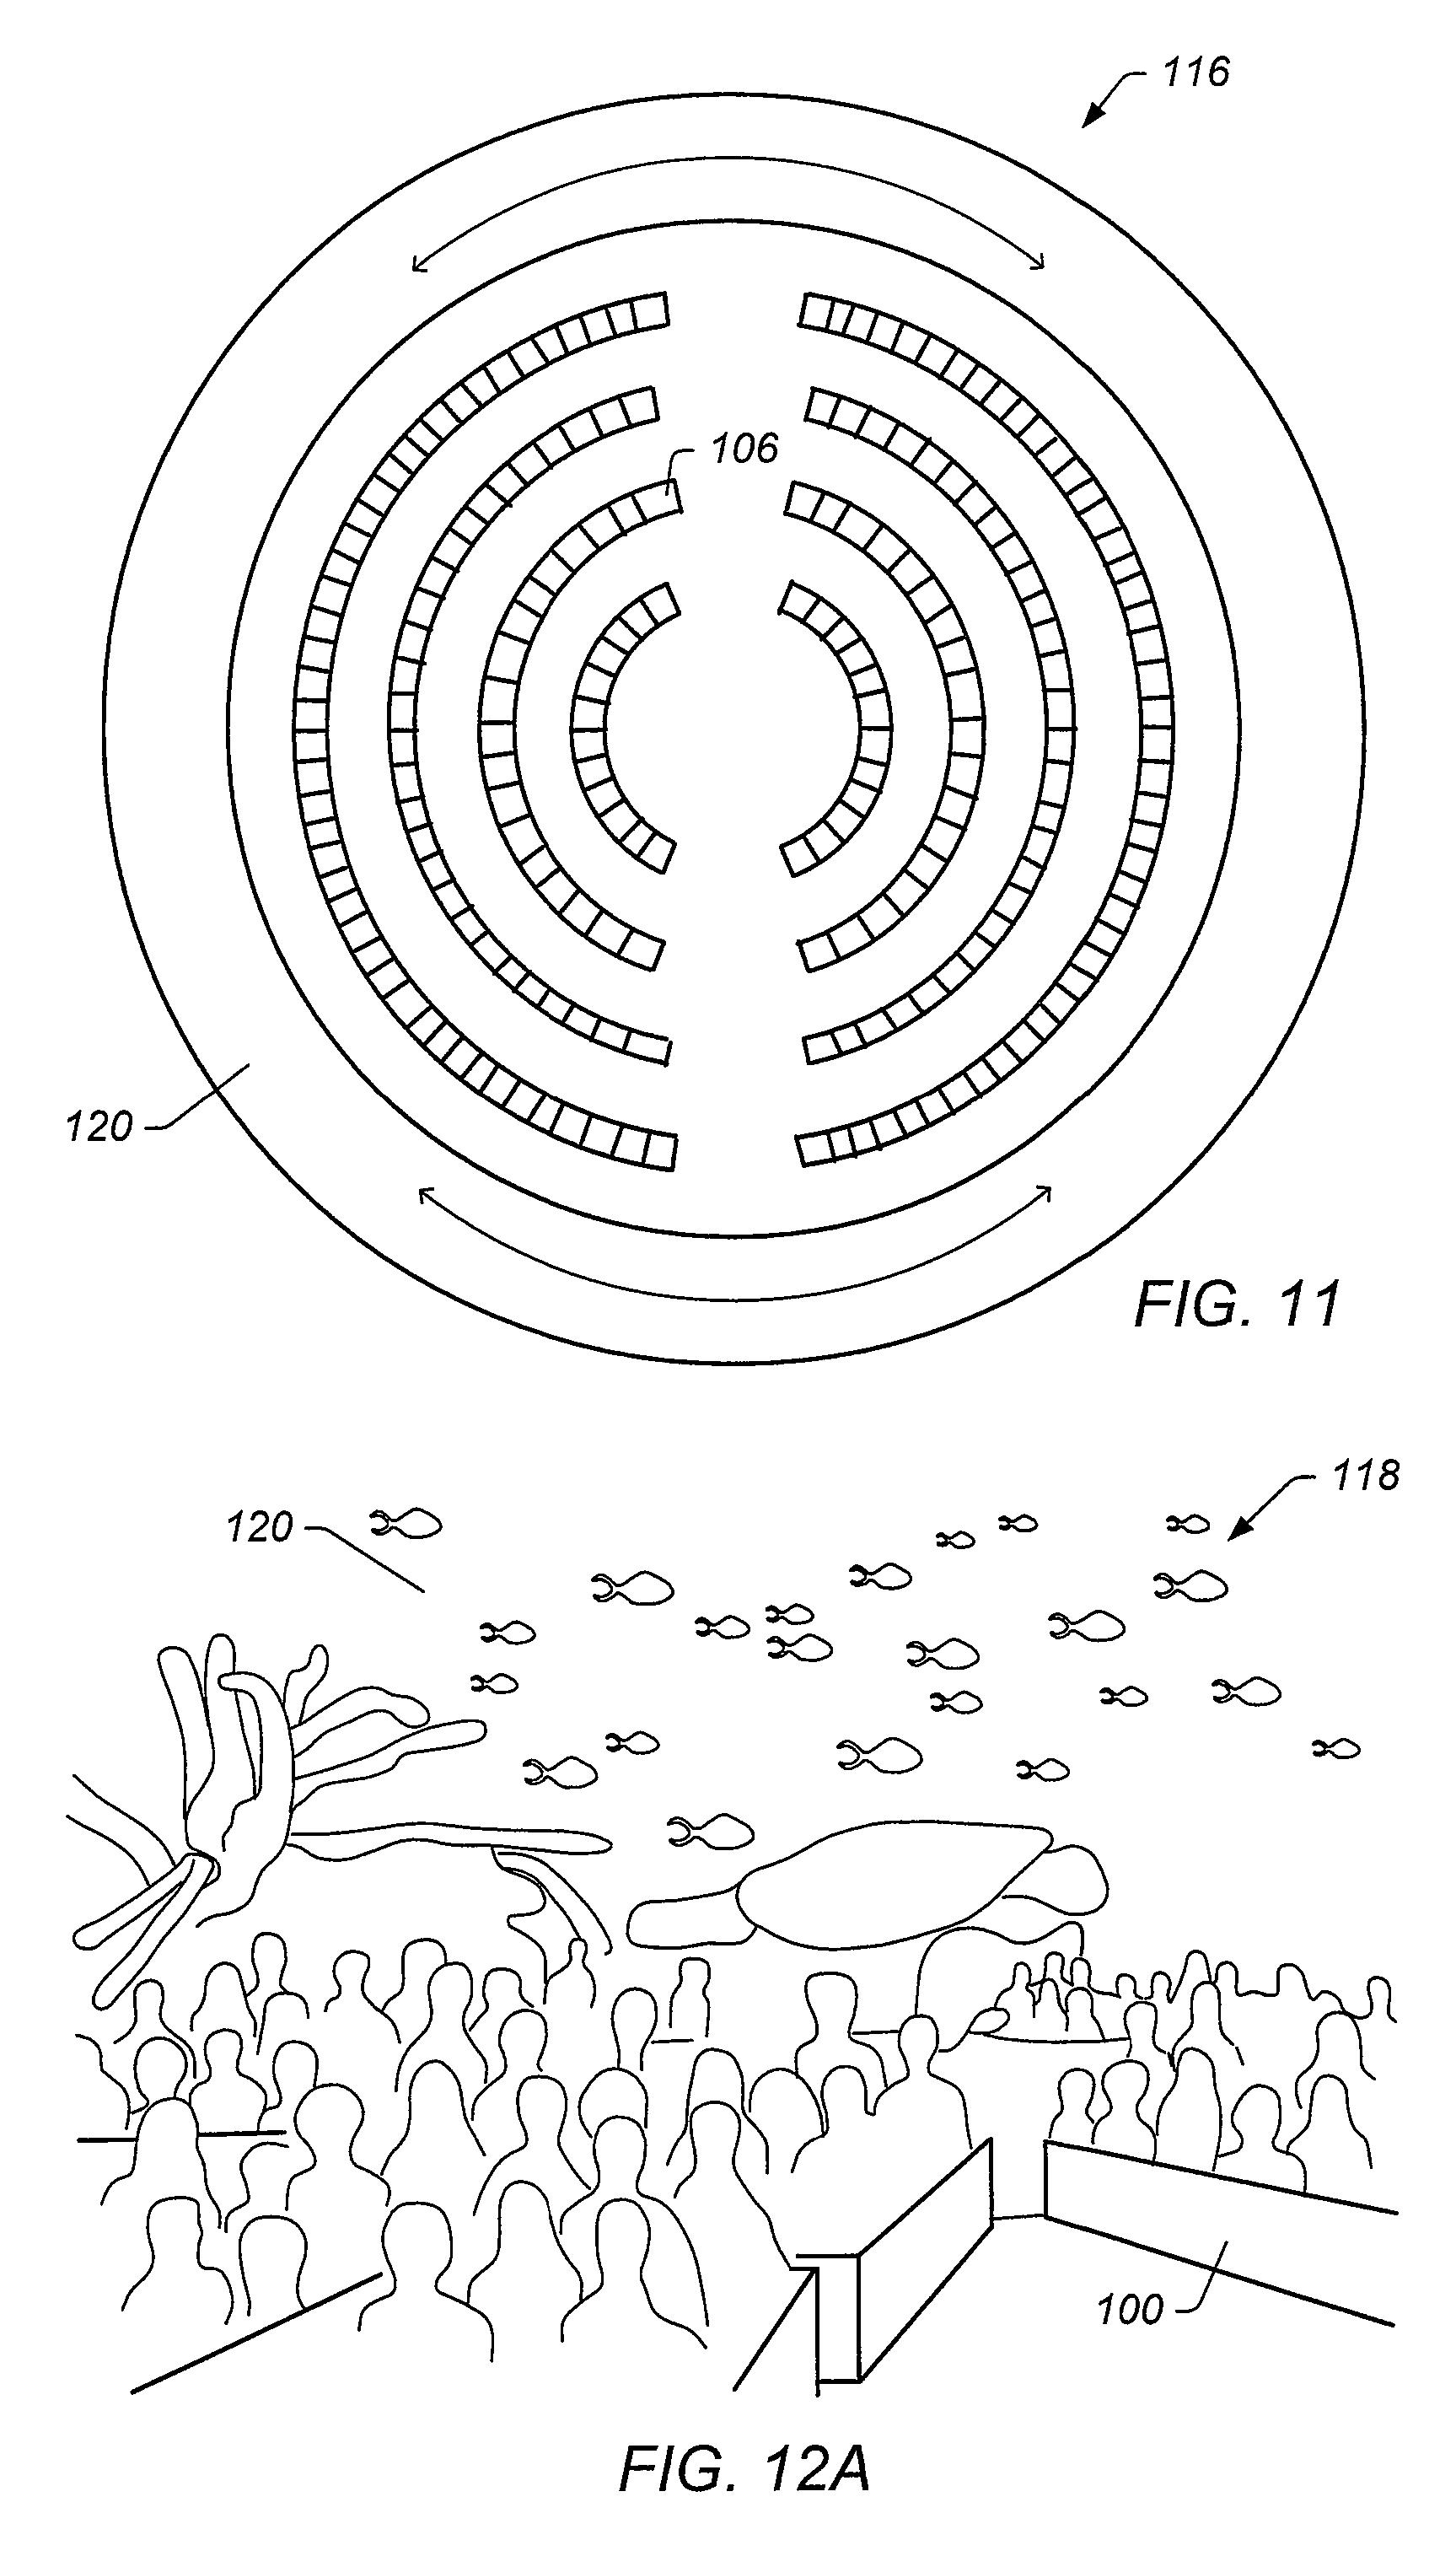 Patent US 8,079,916 B2